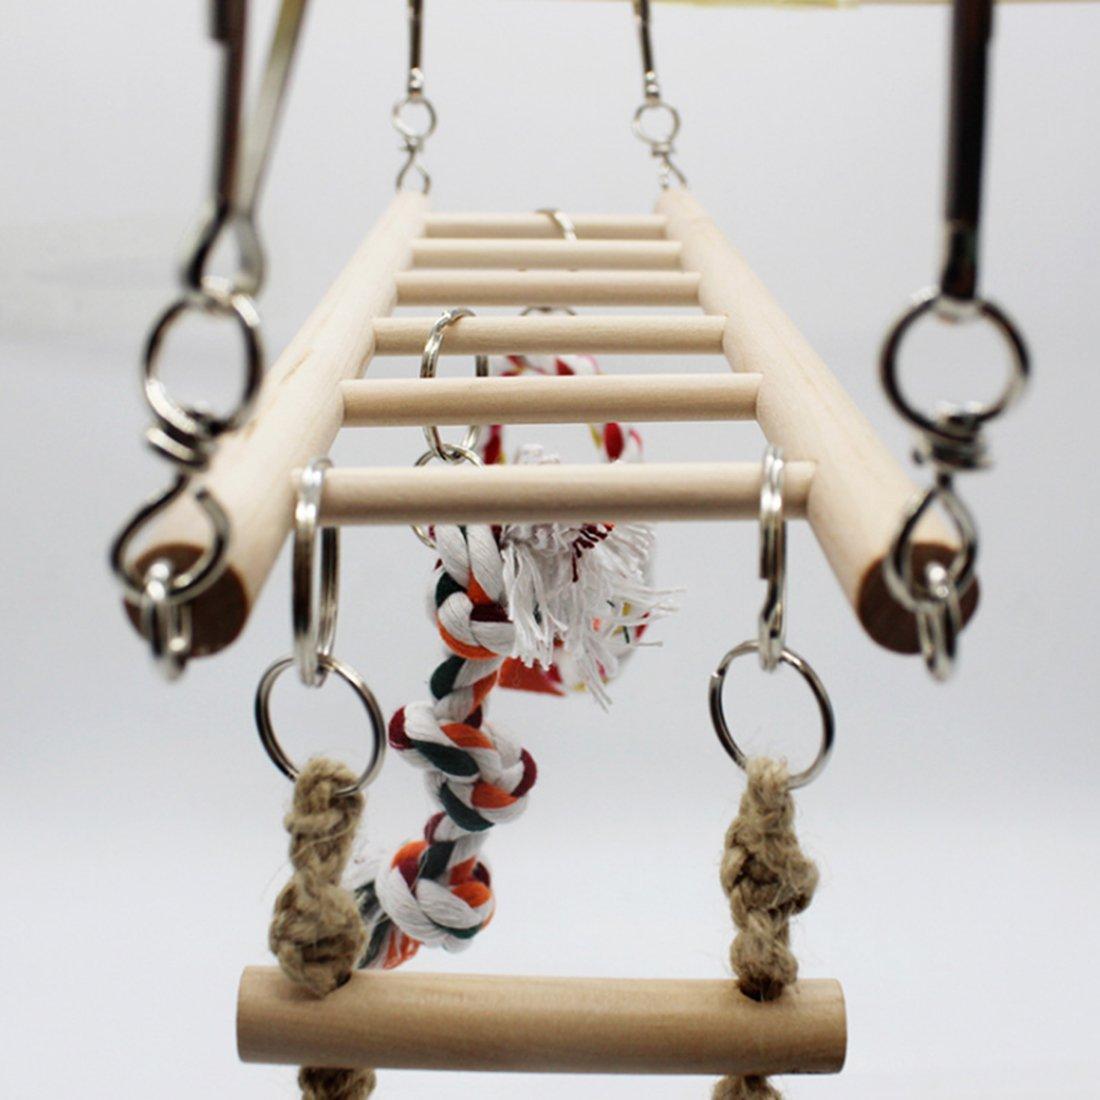 JOYBI Bird Solid Wood Climbing Ladder Swing Chew Toy Parrot Birdcage Perch